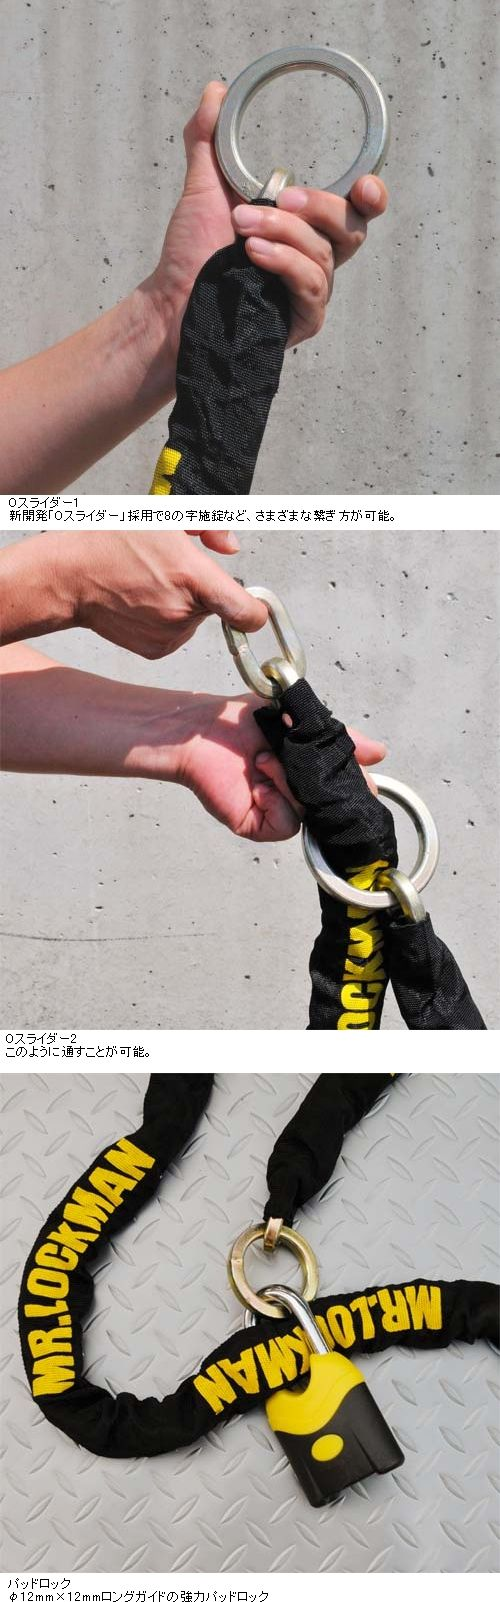 【MR.LOCKMAN】MR Lockman Wild Slider Chain Strong8 2000mm 強力鋼鎖 - 「Webike-摩托百貨」